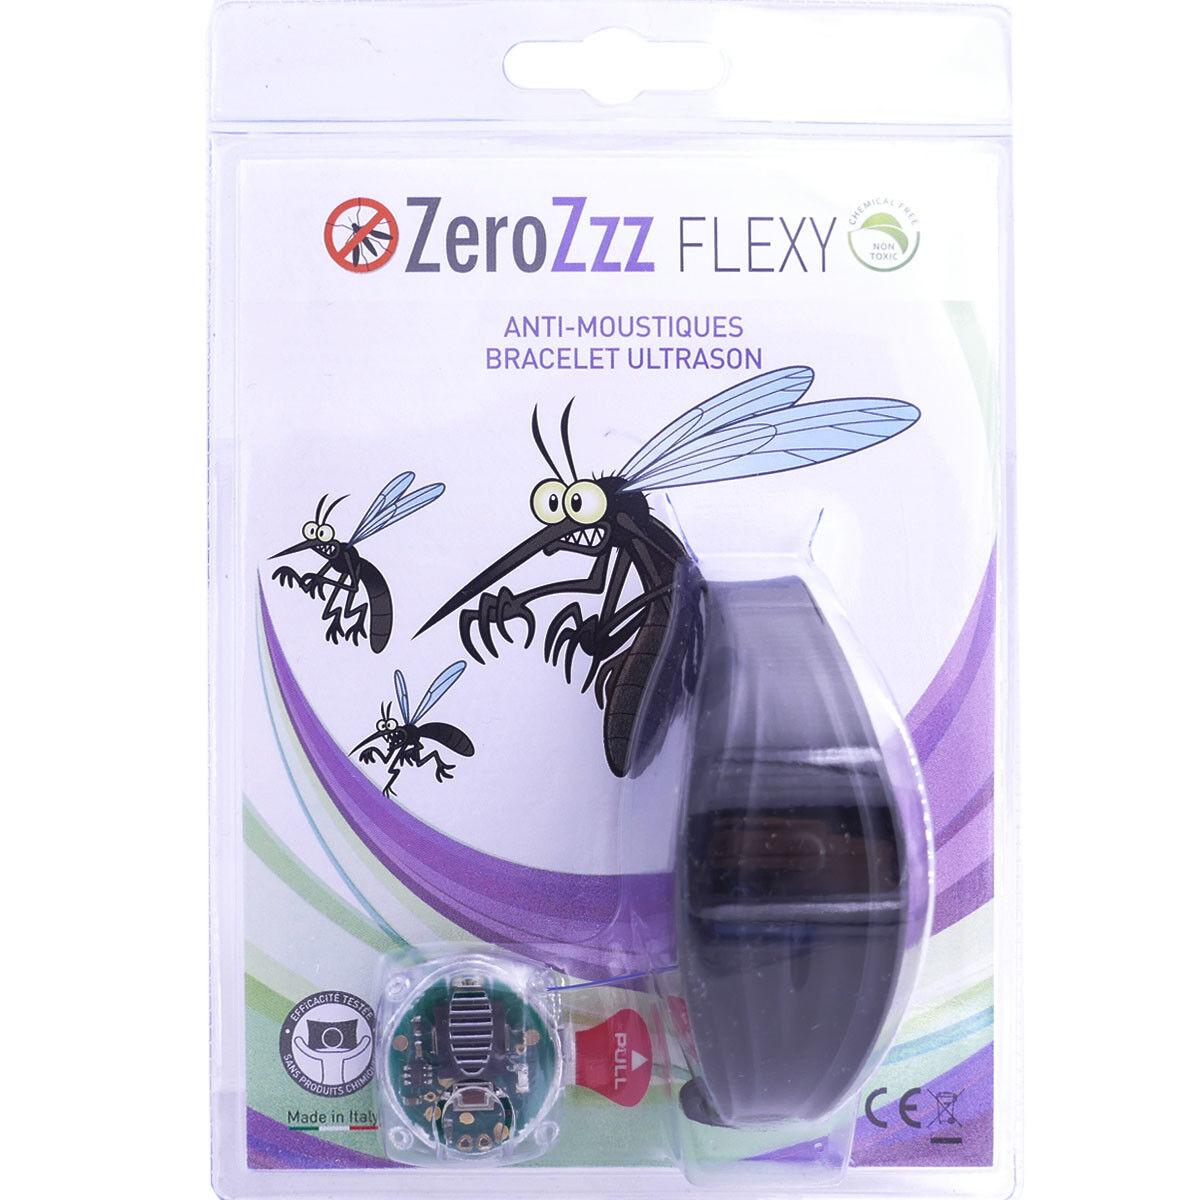 DIVERS Zerozzz flexy anti moustiques bracelet ultrason